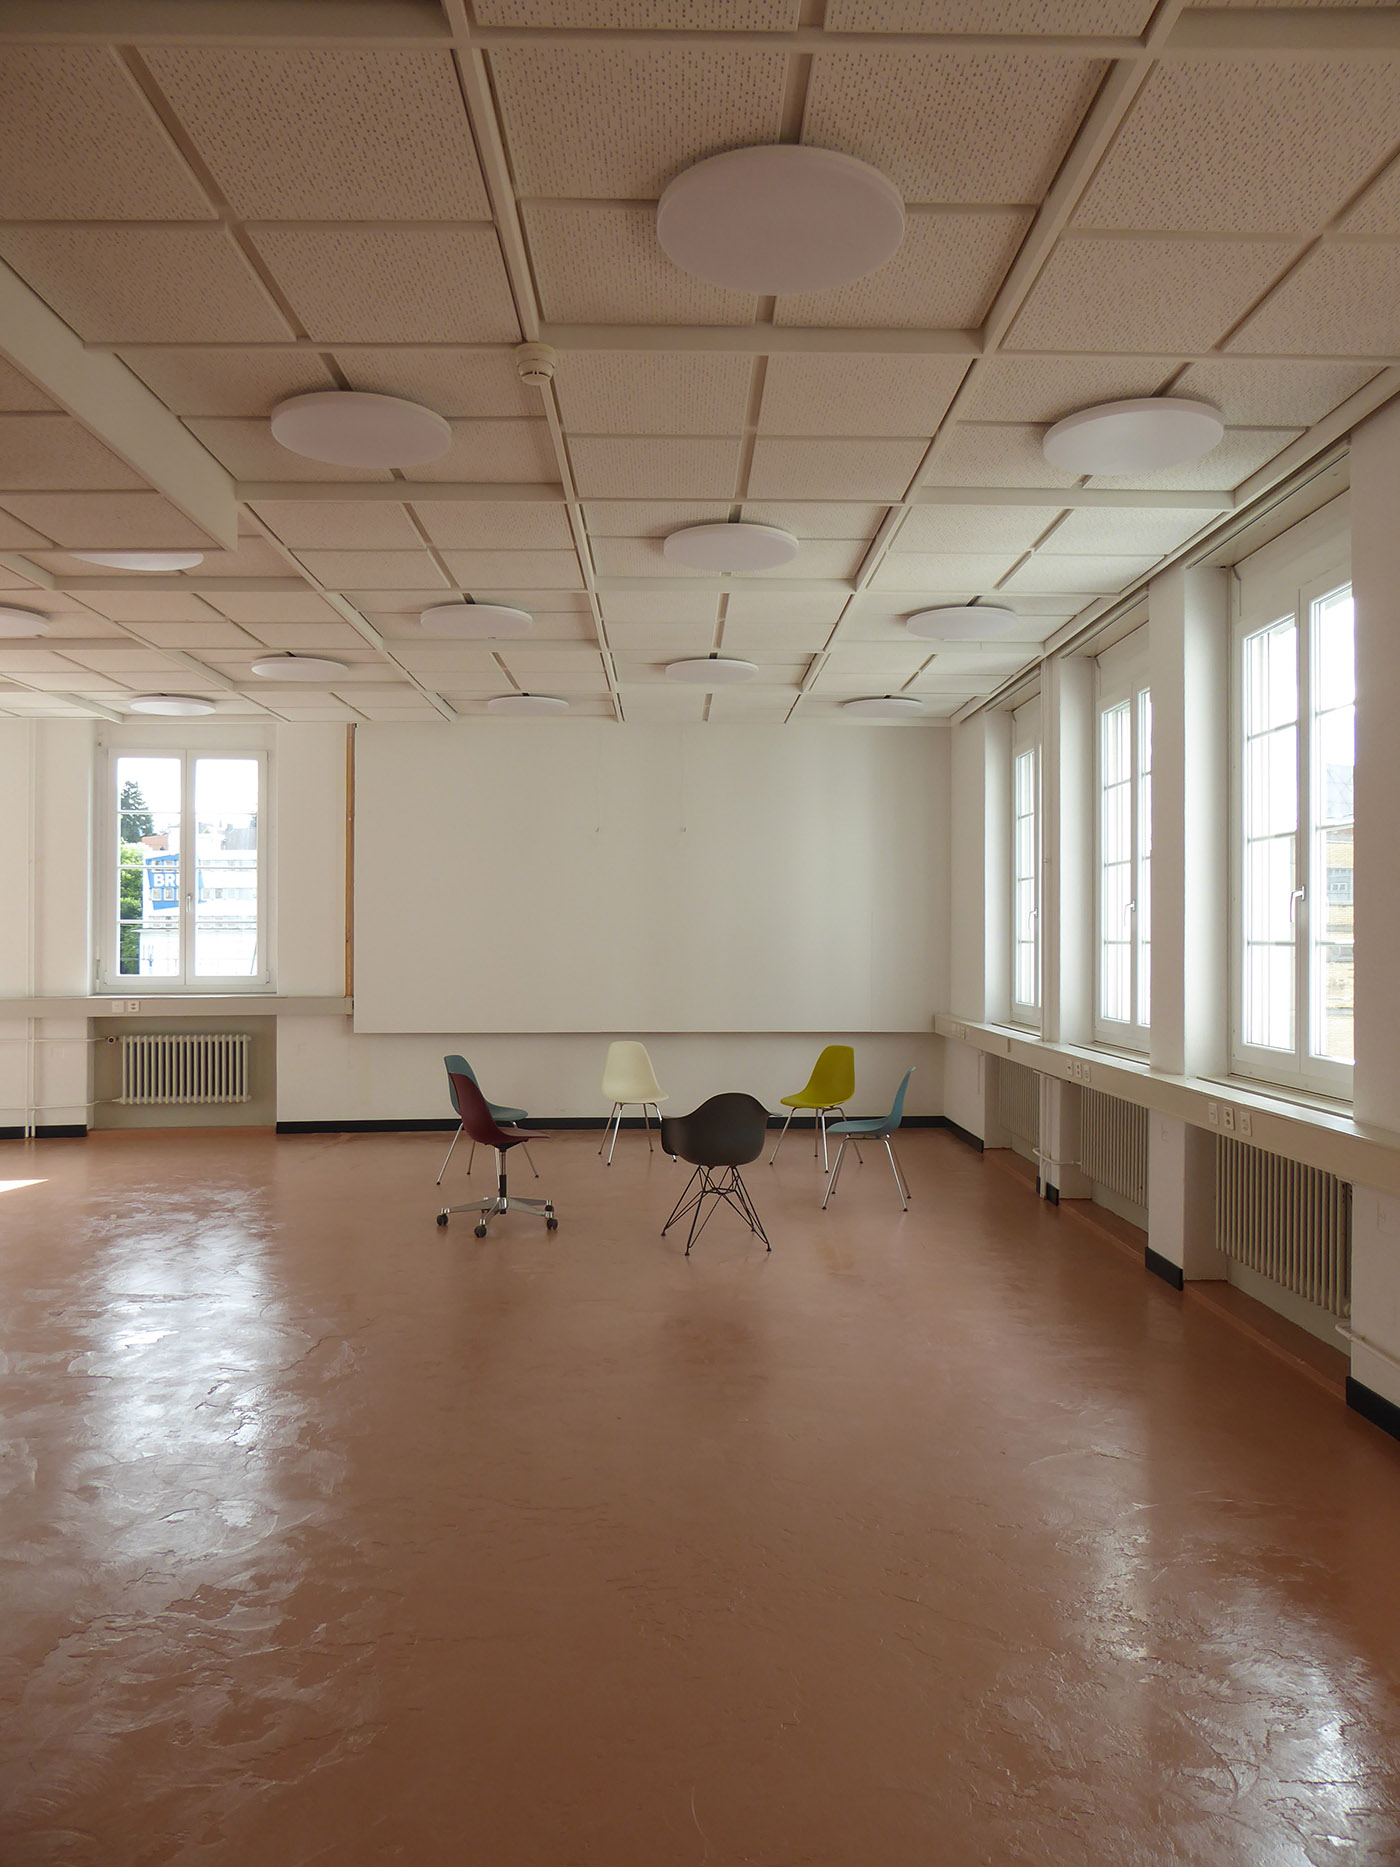 buan architekten – Umbau Büro Viscosistadt– Fertigstellung 2